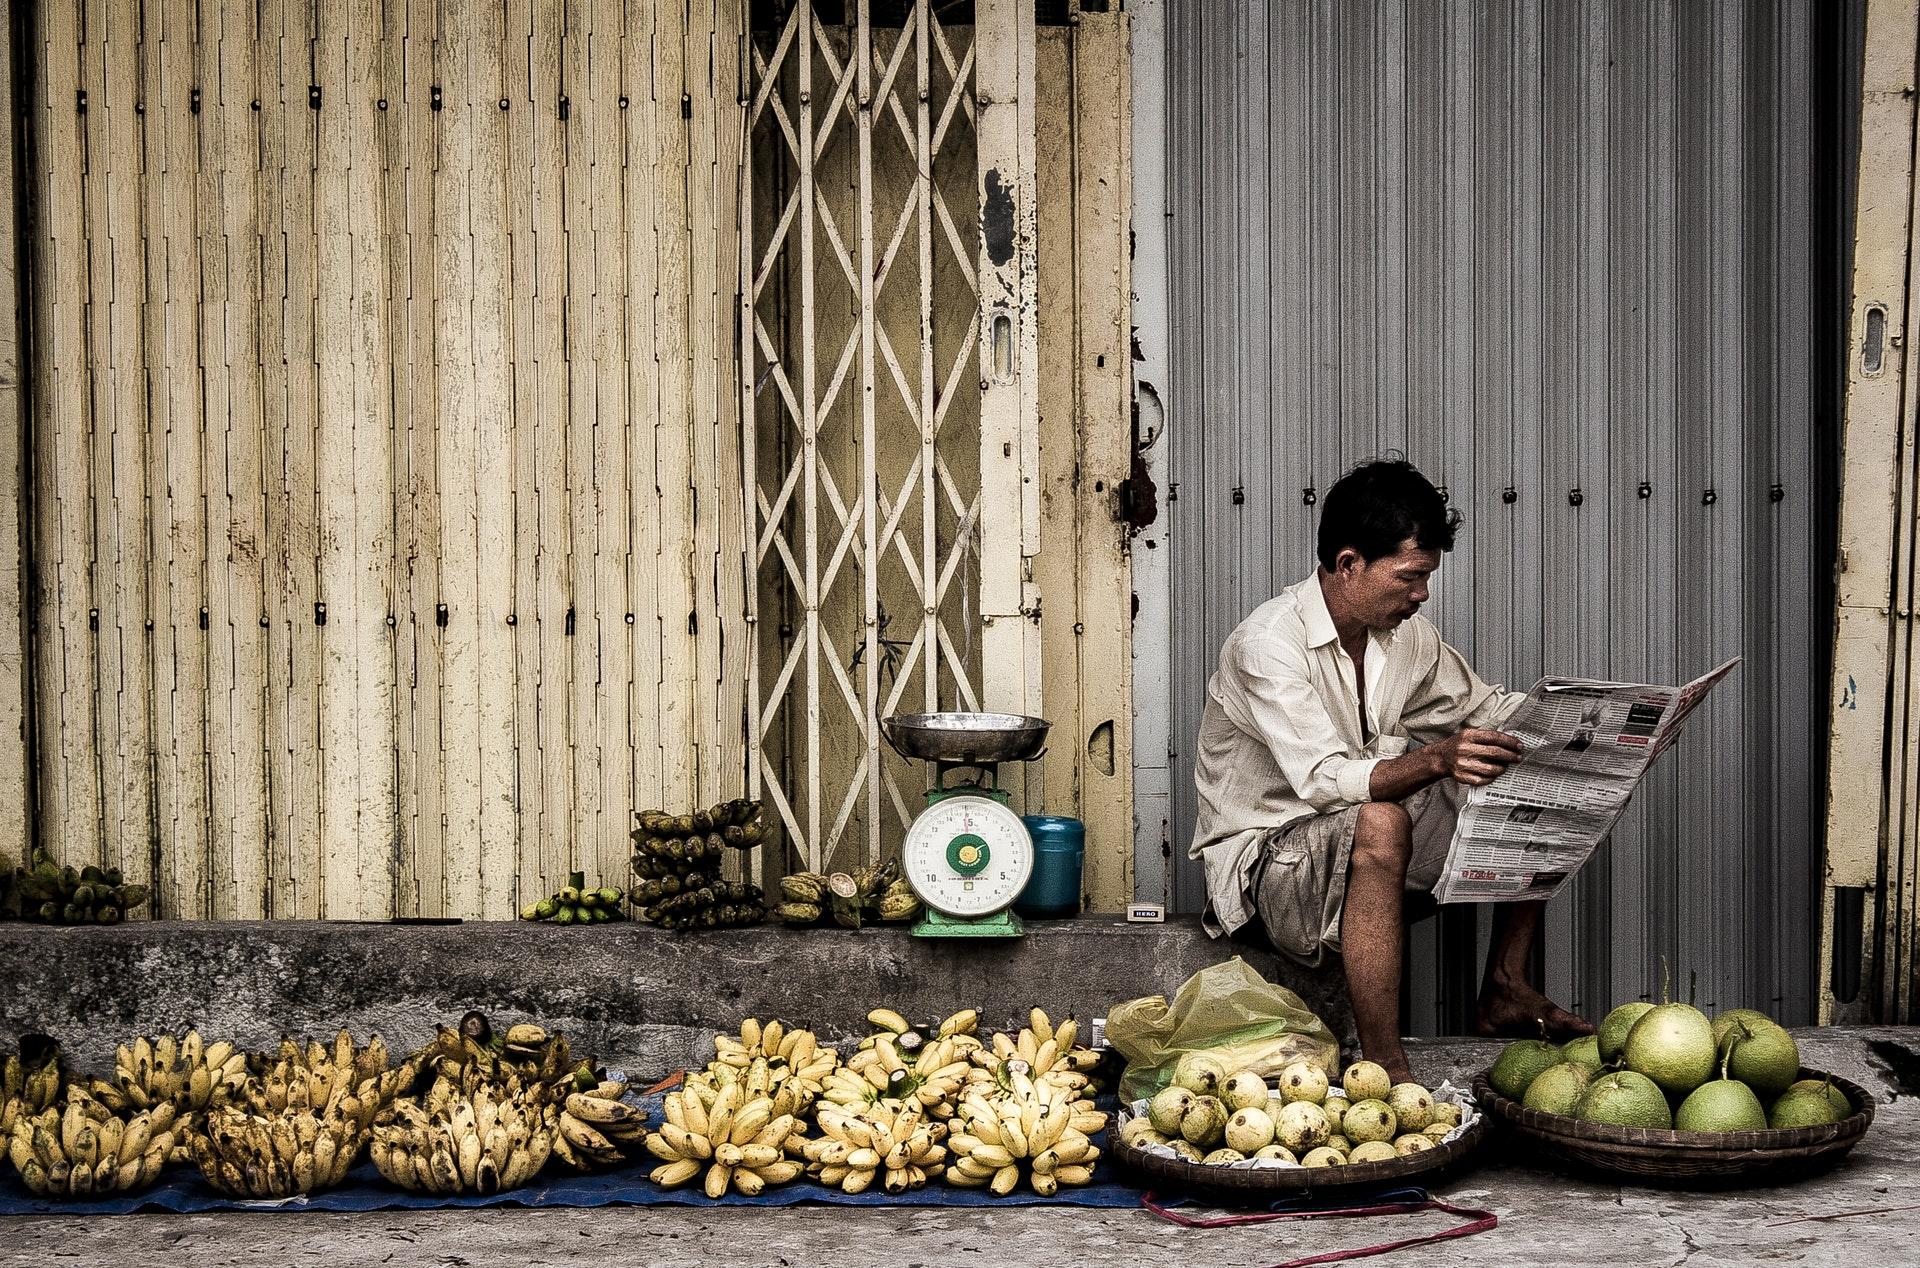 Vietnam-Fruit-Seller-Market